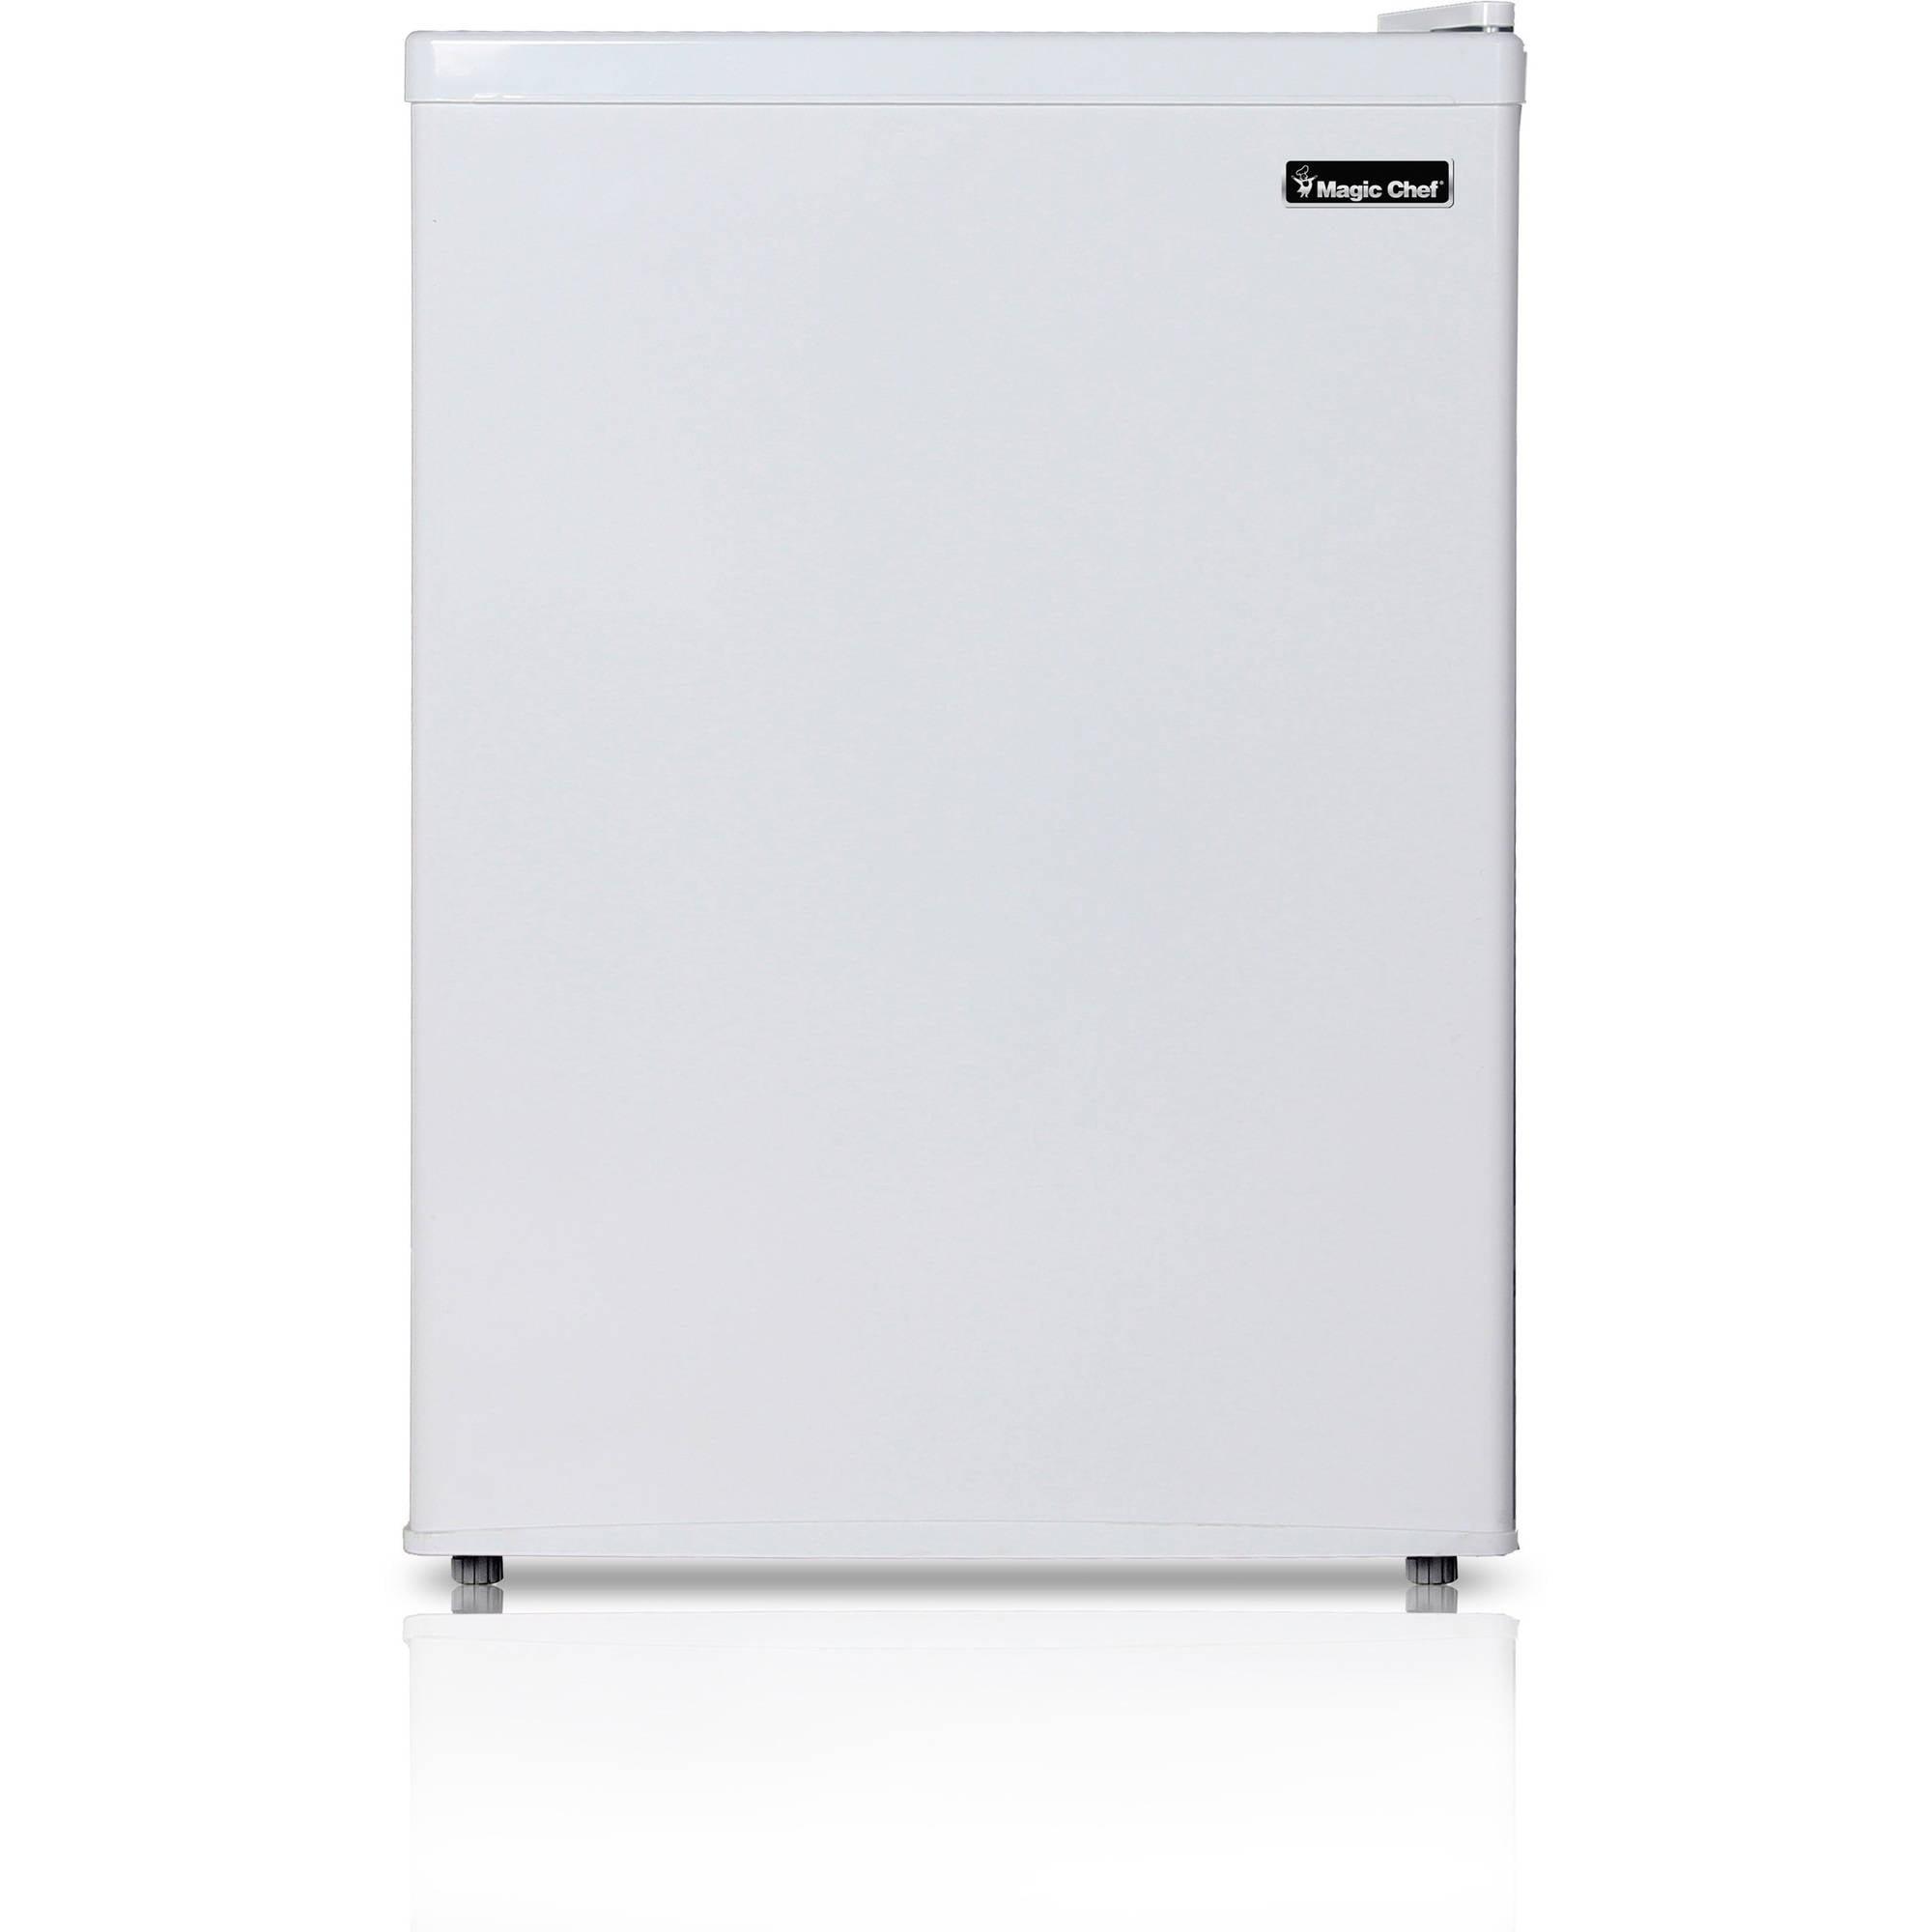 Magic Chef 2 4 Cu Ft Compact Single Door Refrigerator